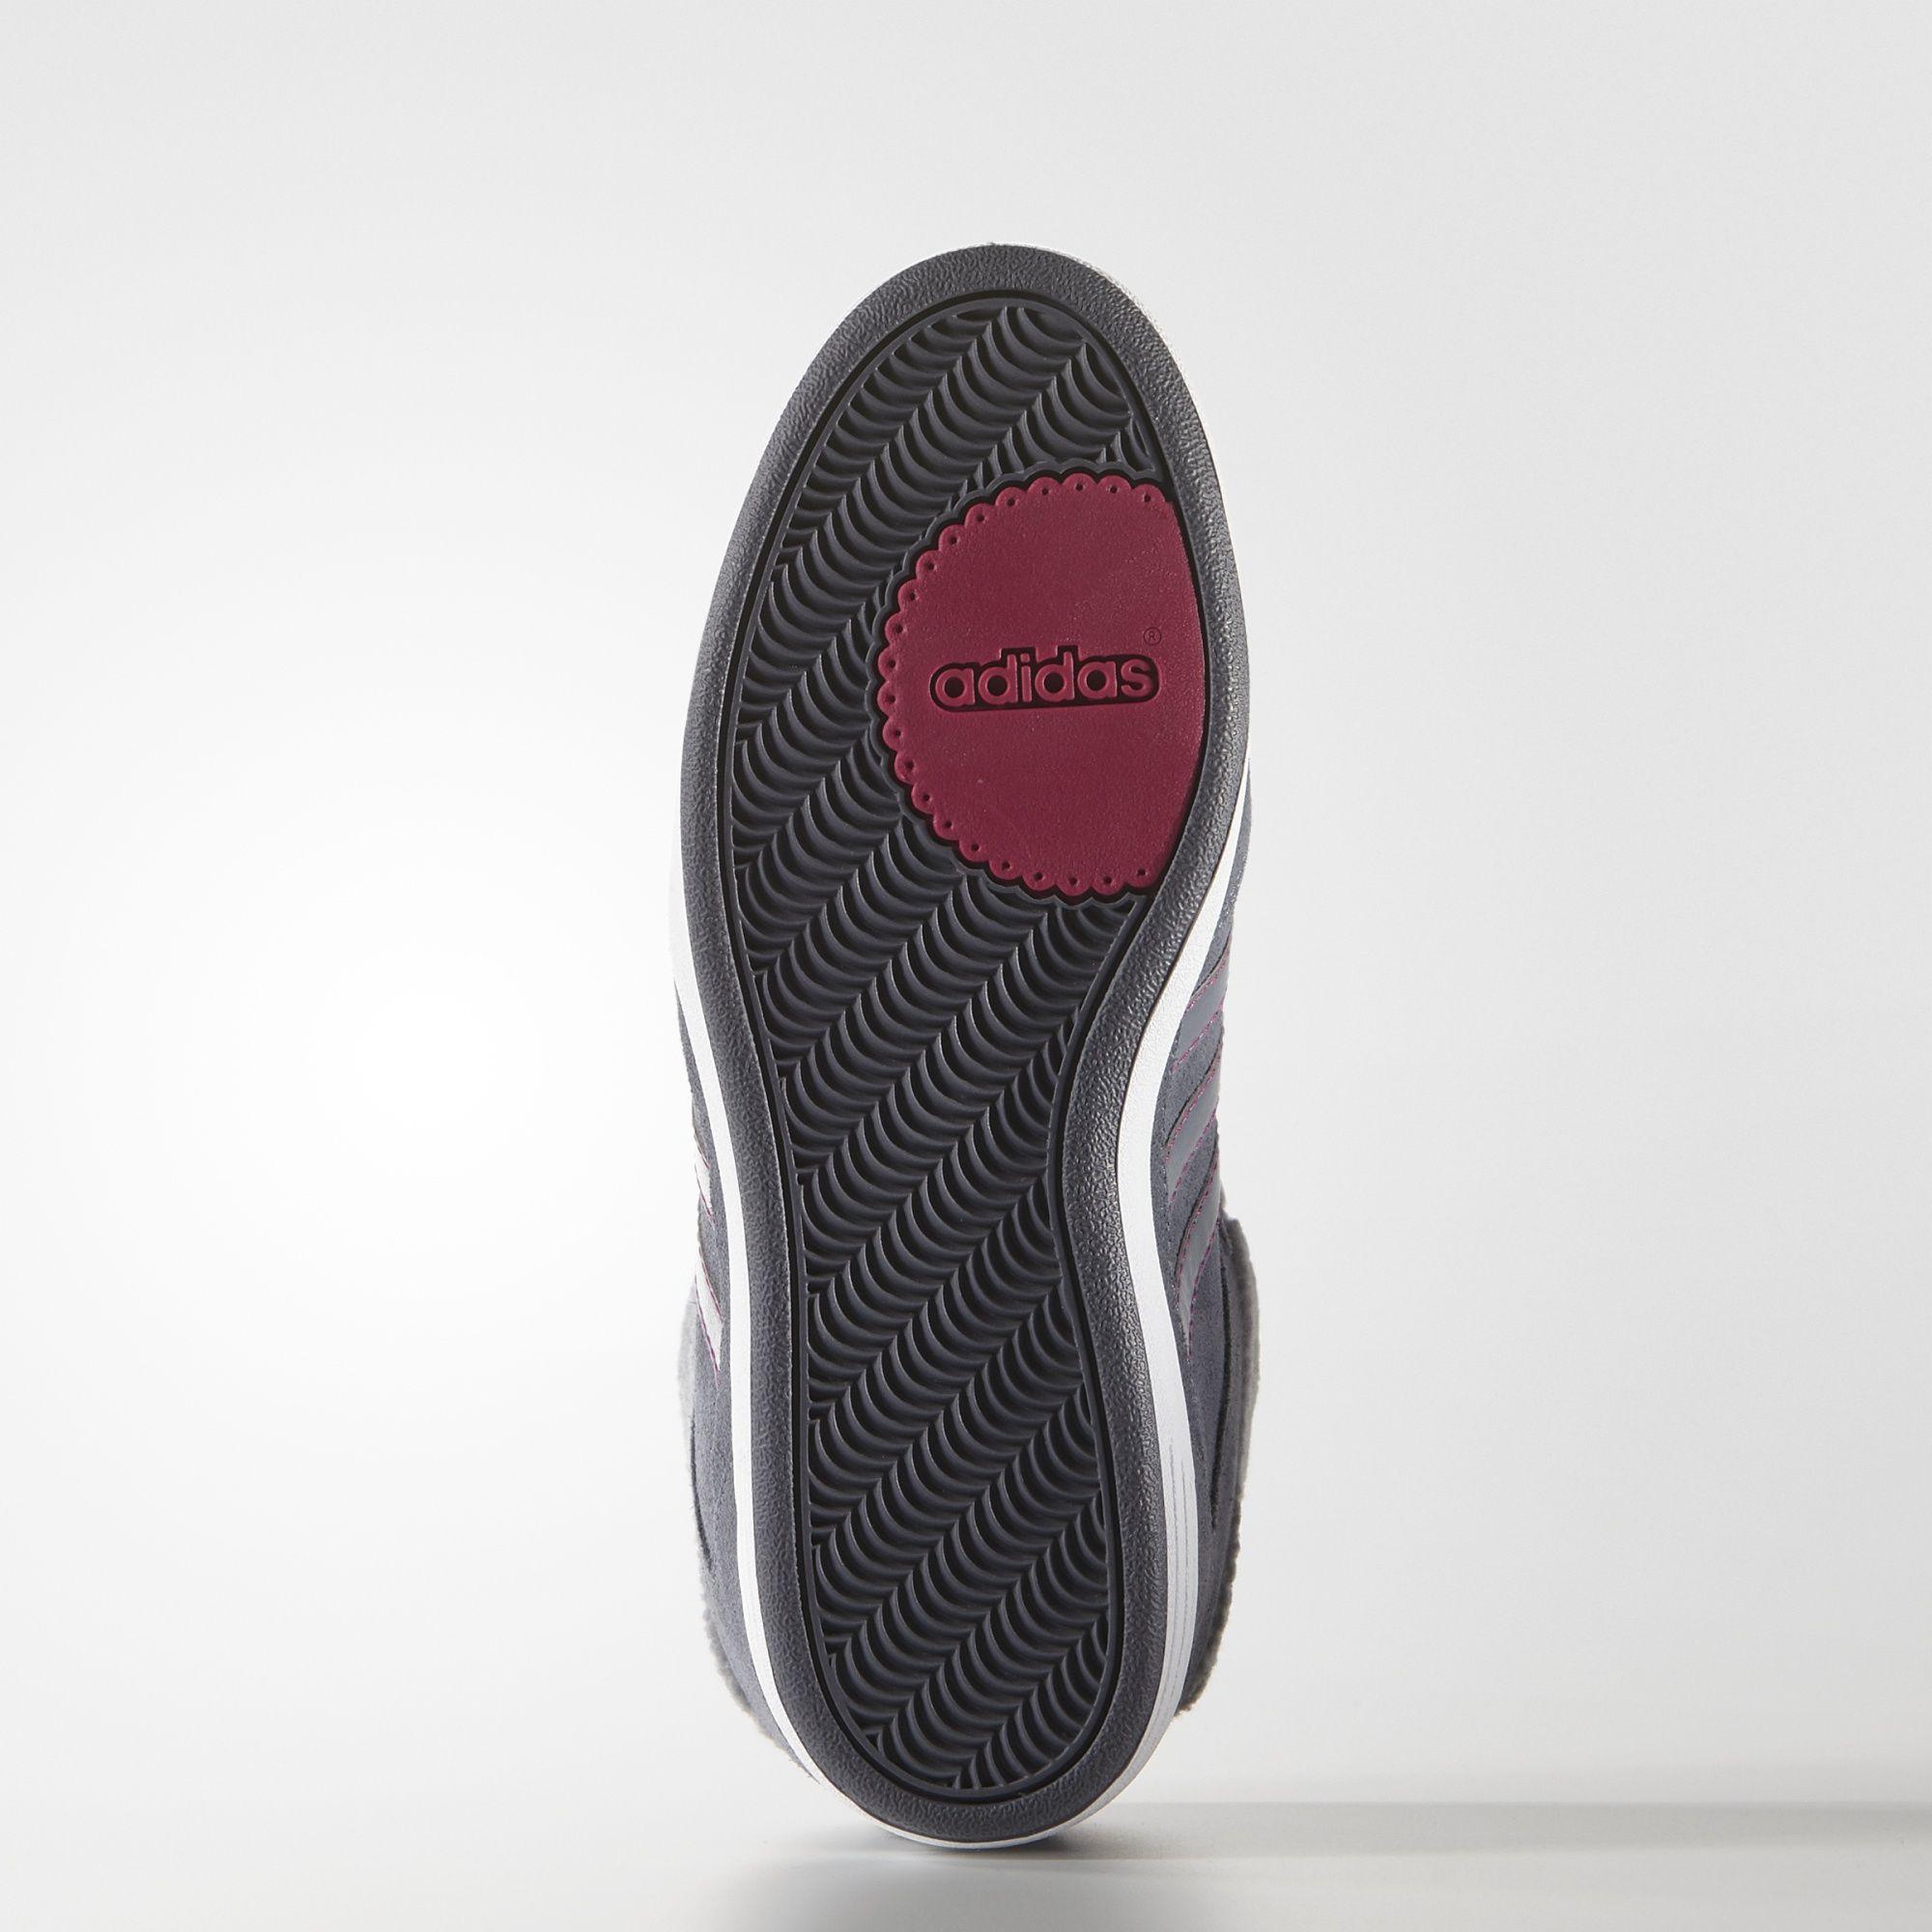 ea721276d793 Super Wedge W AW4854 adidas Neo - Украина